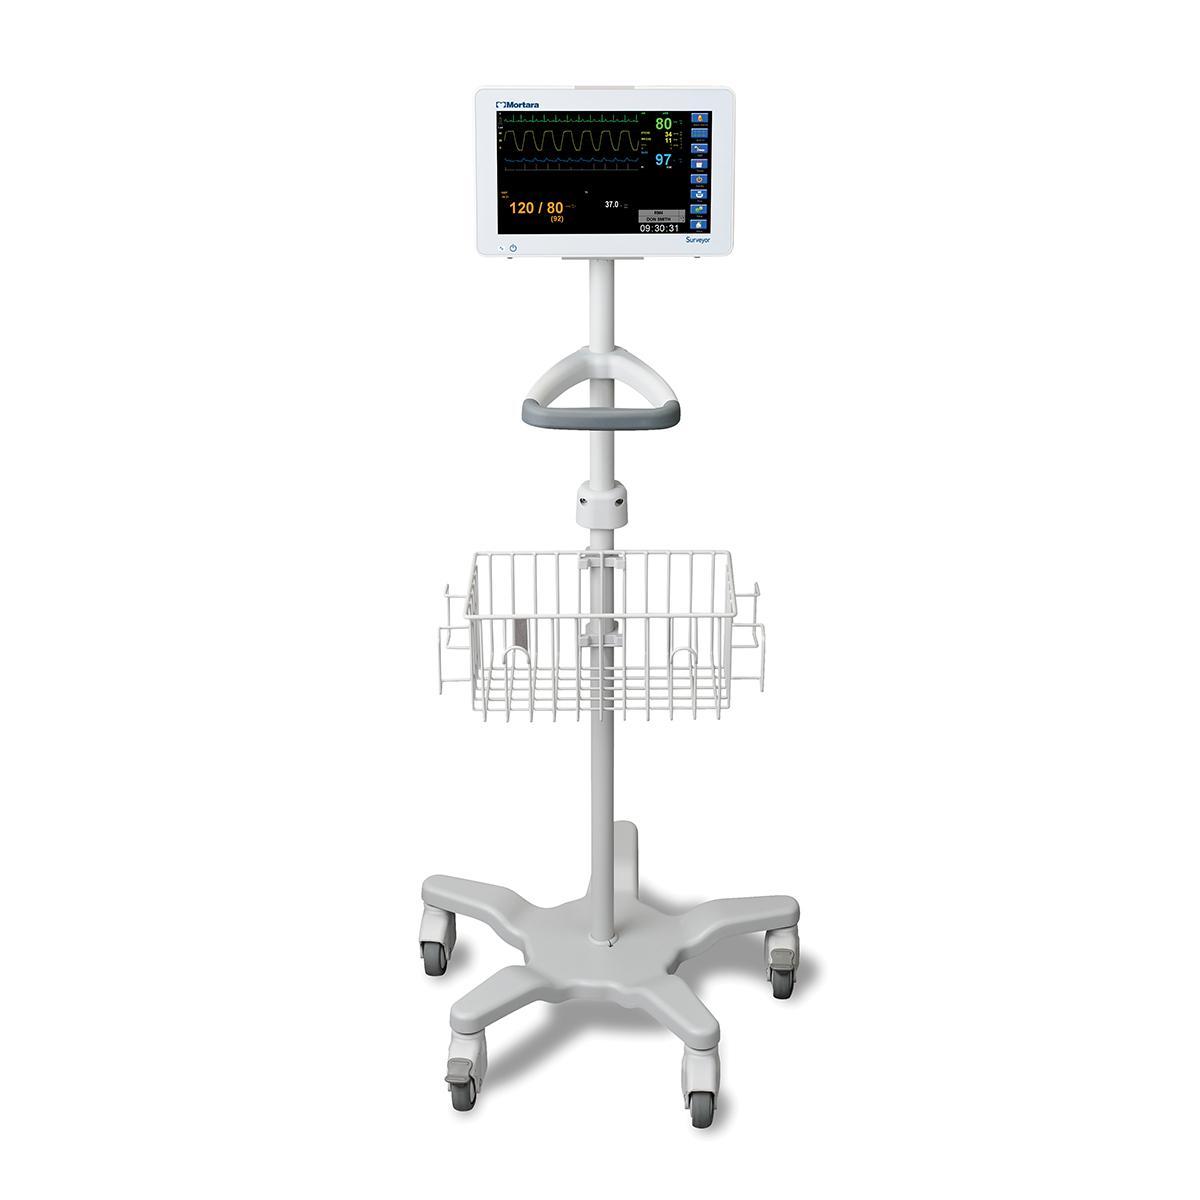 Wall-mounted Surveyor S12 monitor